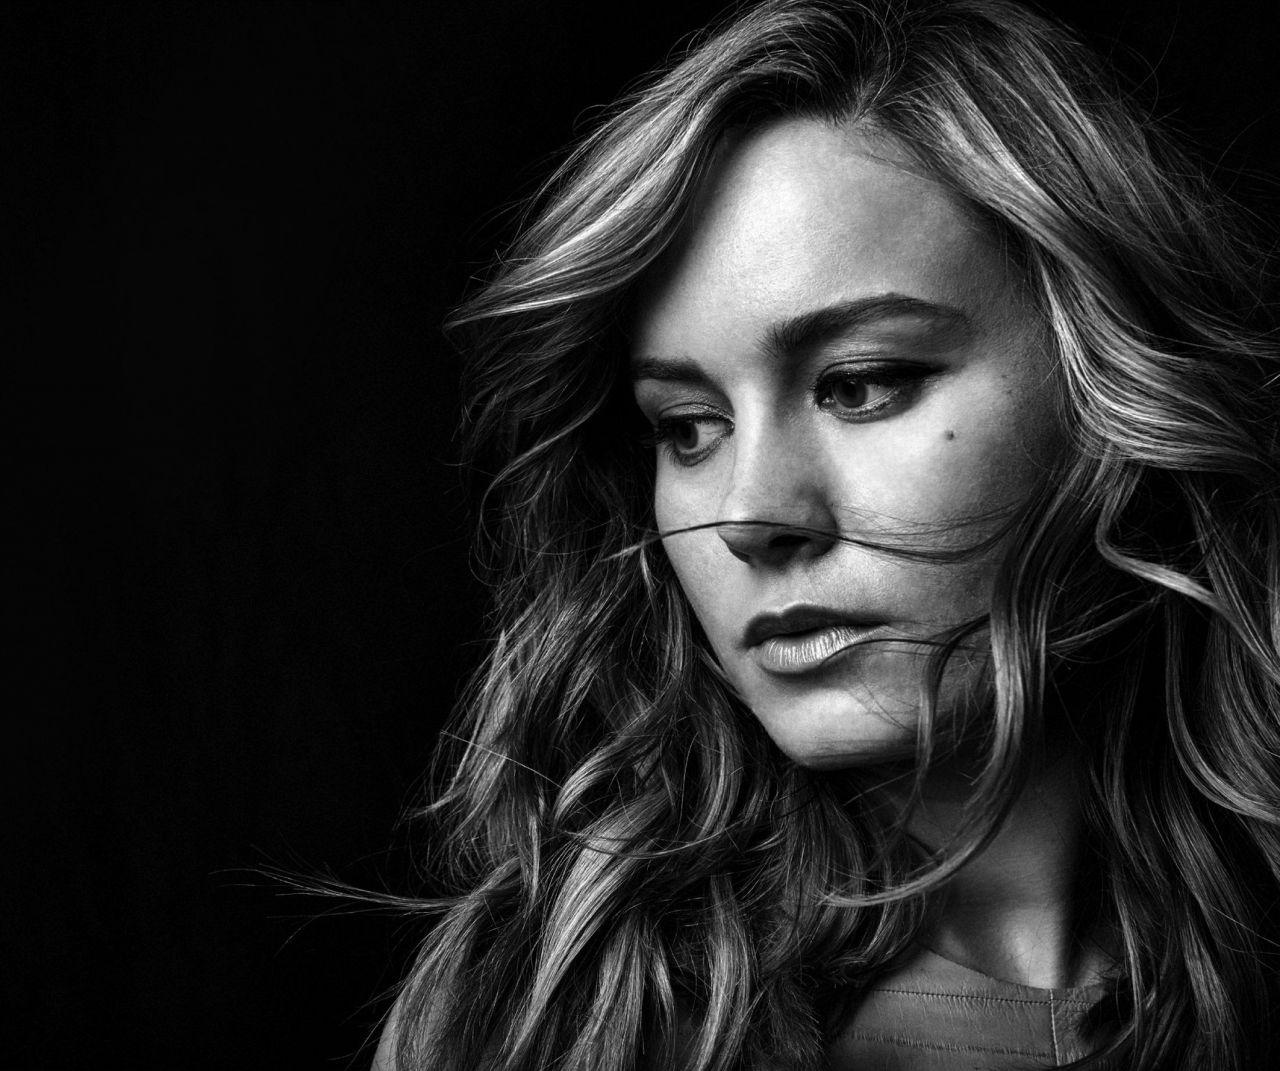 larson shoot Brie photo